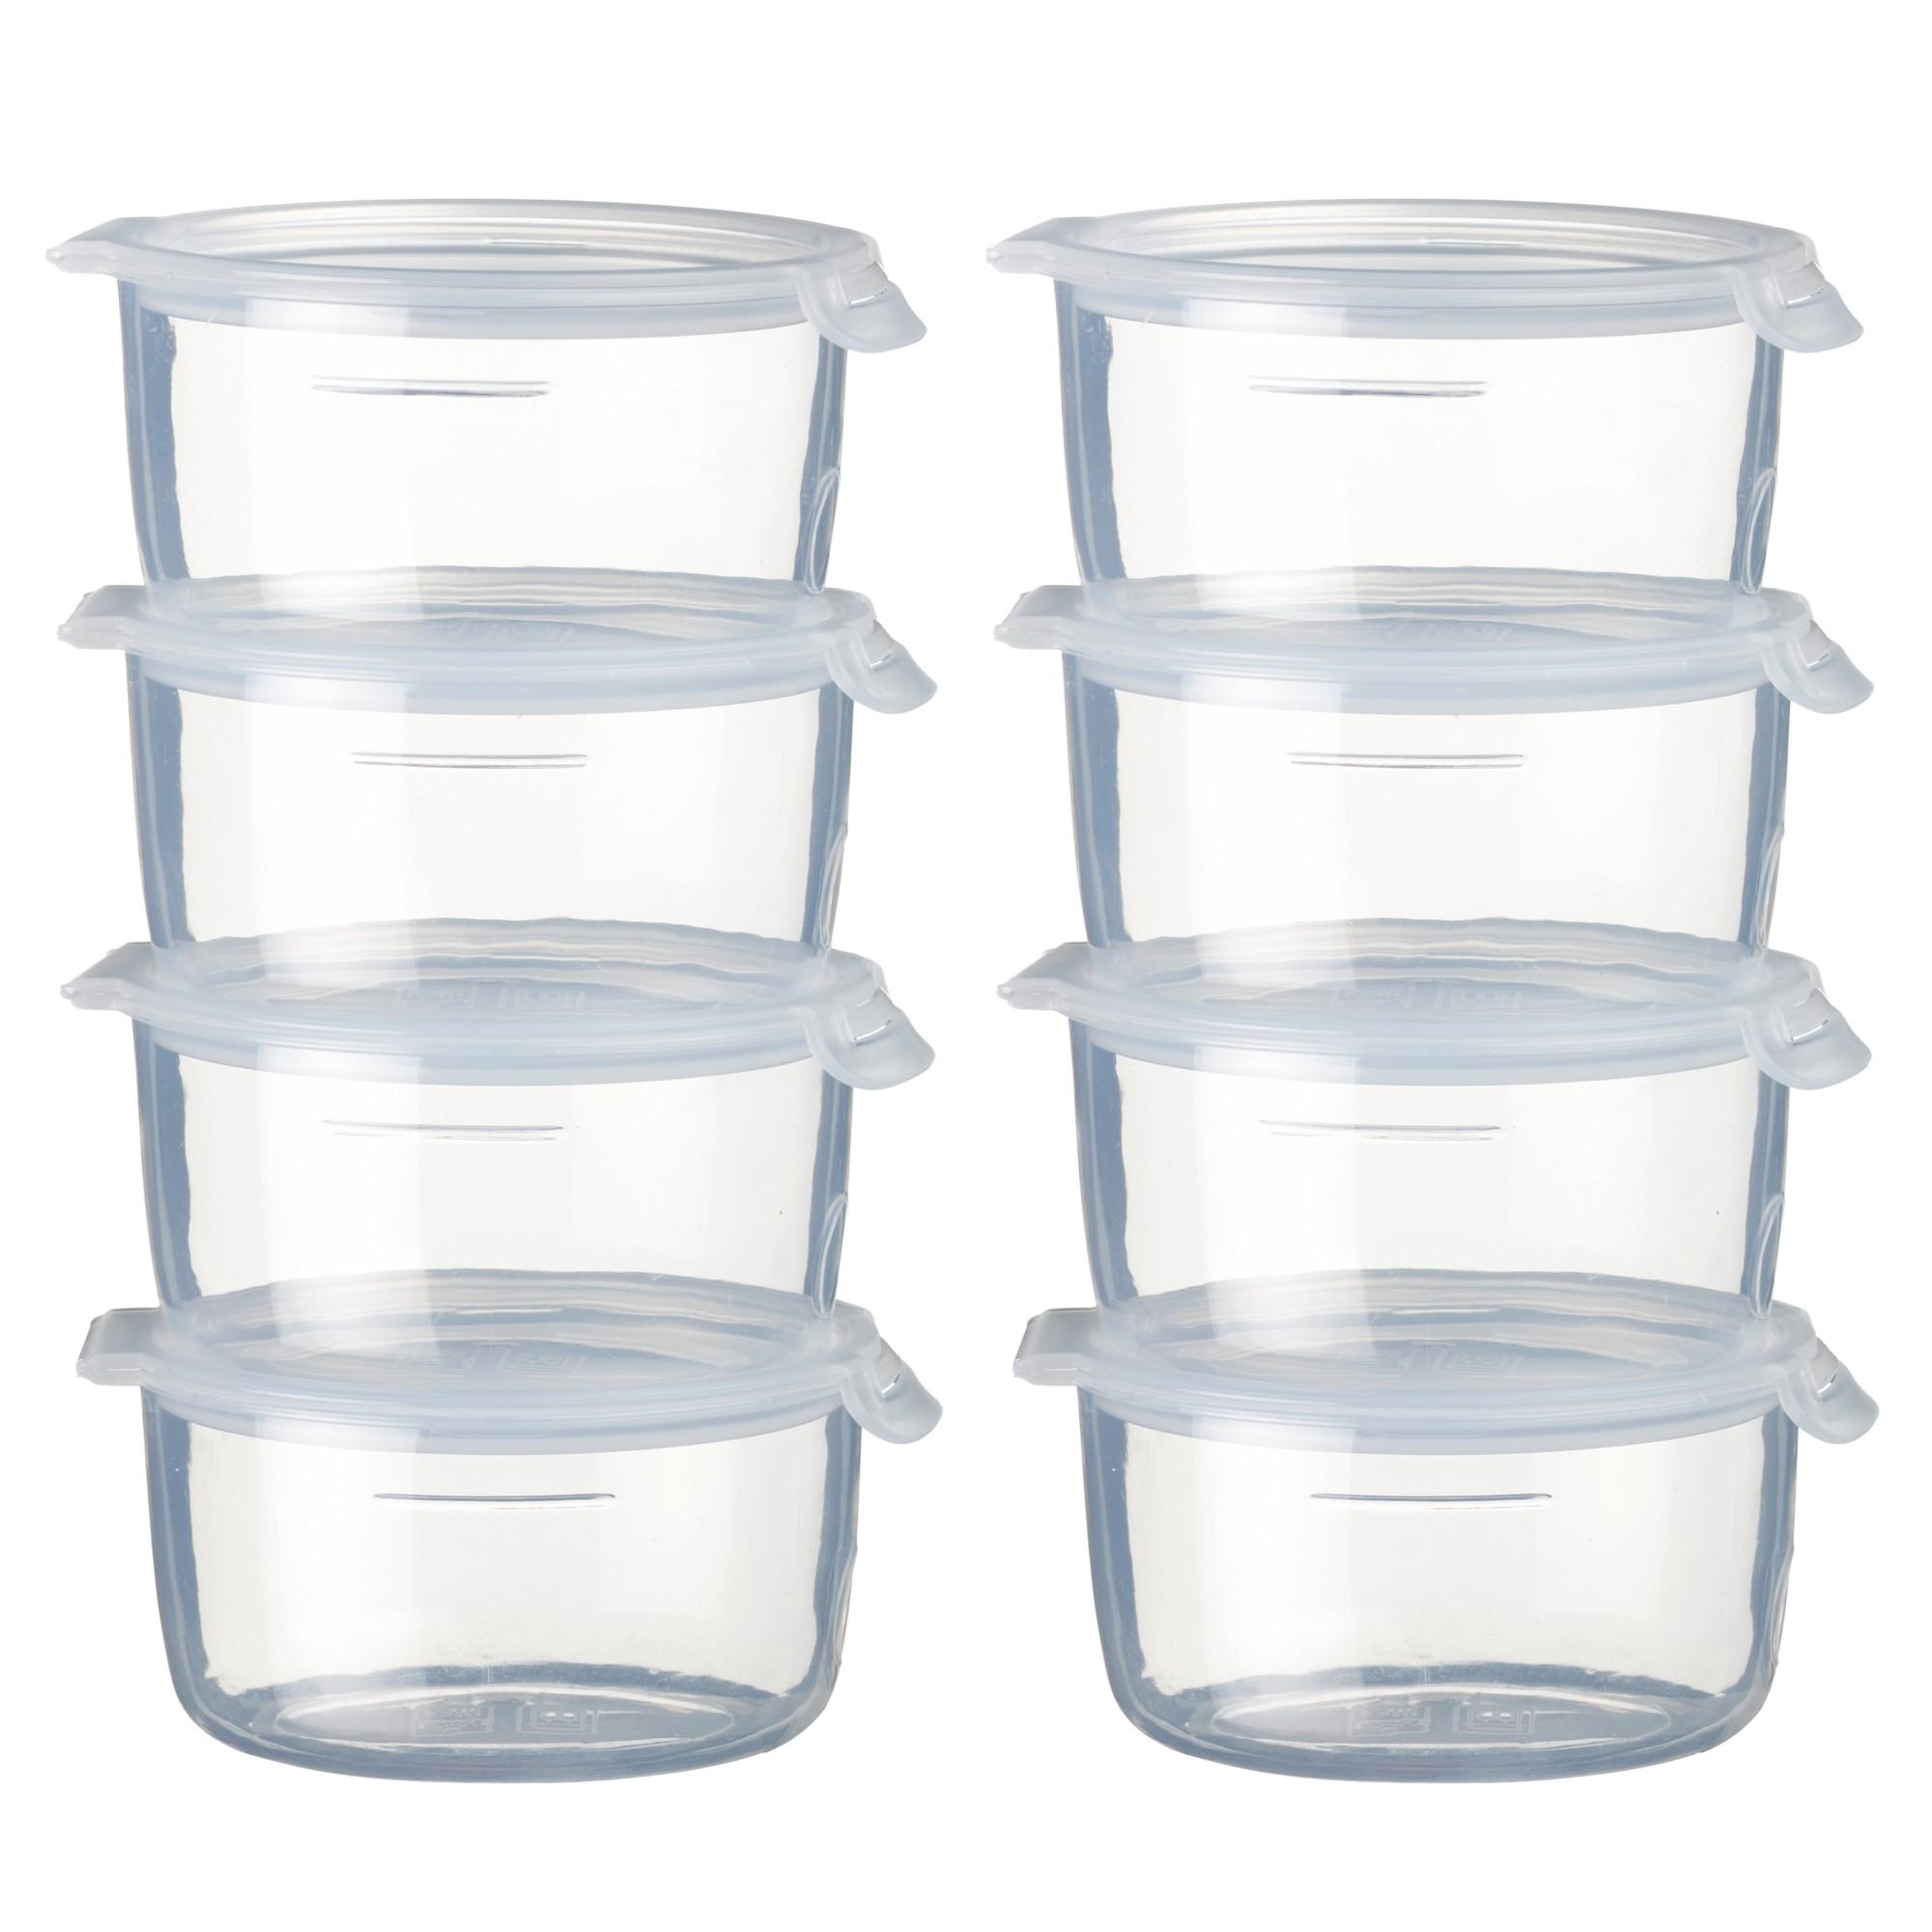 John Lewis Small Freezer Pots